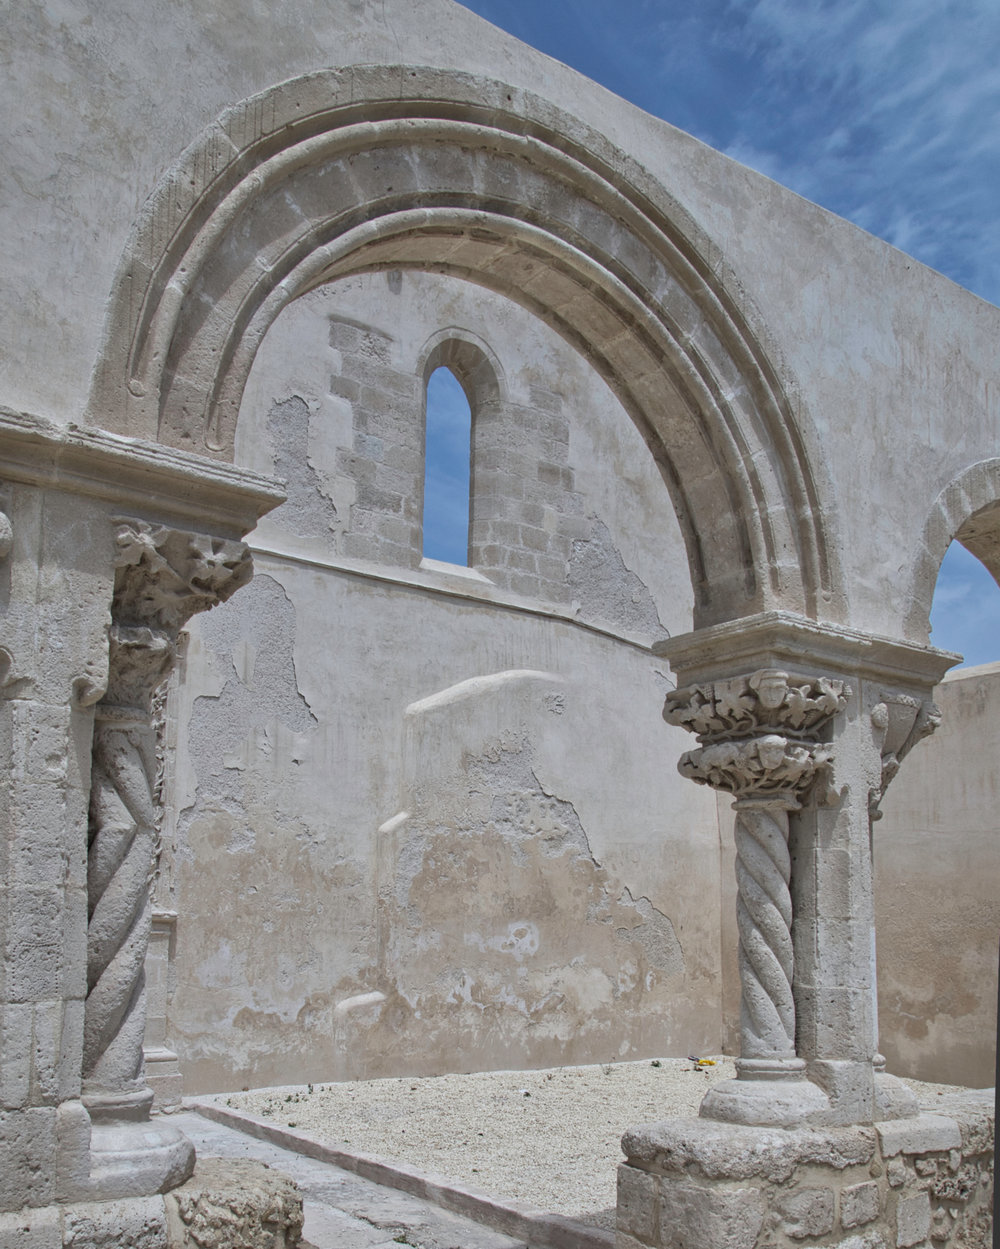 Sicilia Siracusa Chiesa S. Giovanni alle catacombe-9006.jpeg